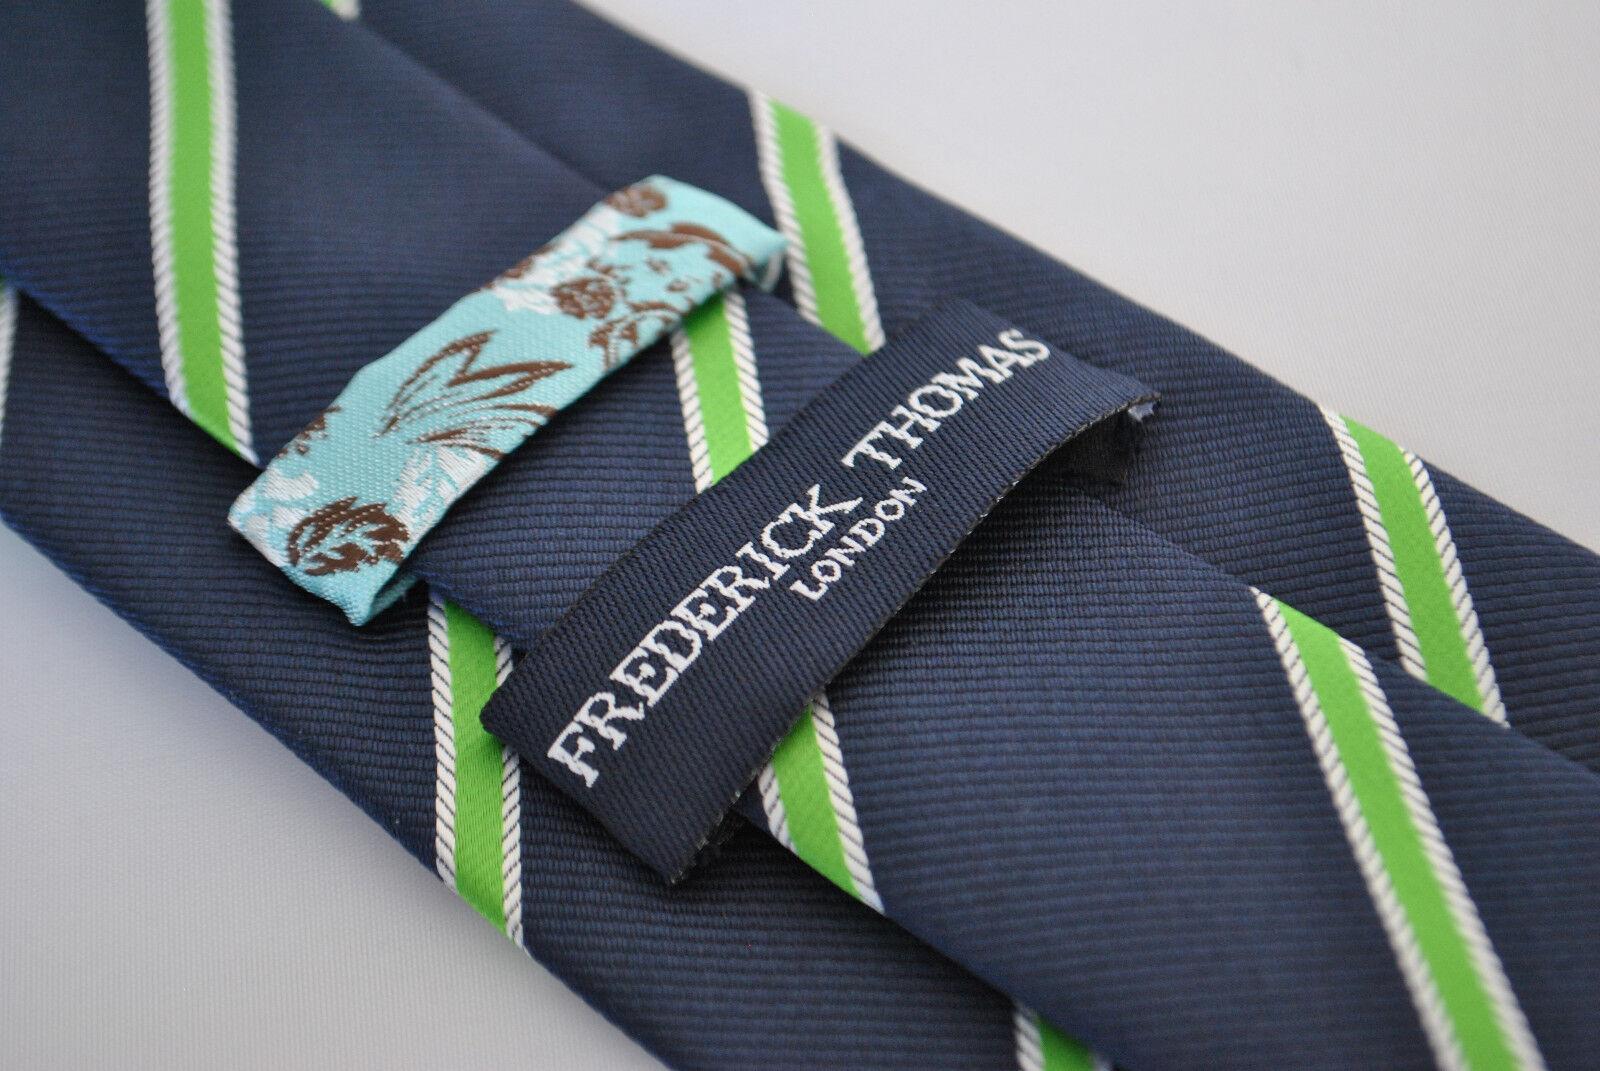 Frederick Thomas Marineblau Krawatte Mit Springende Weiß Hase Hare Design Nordic